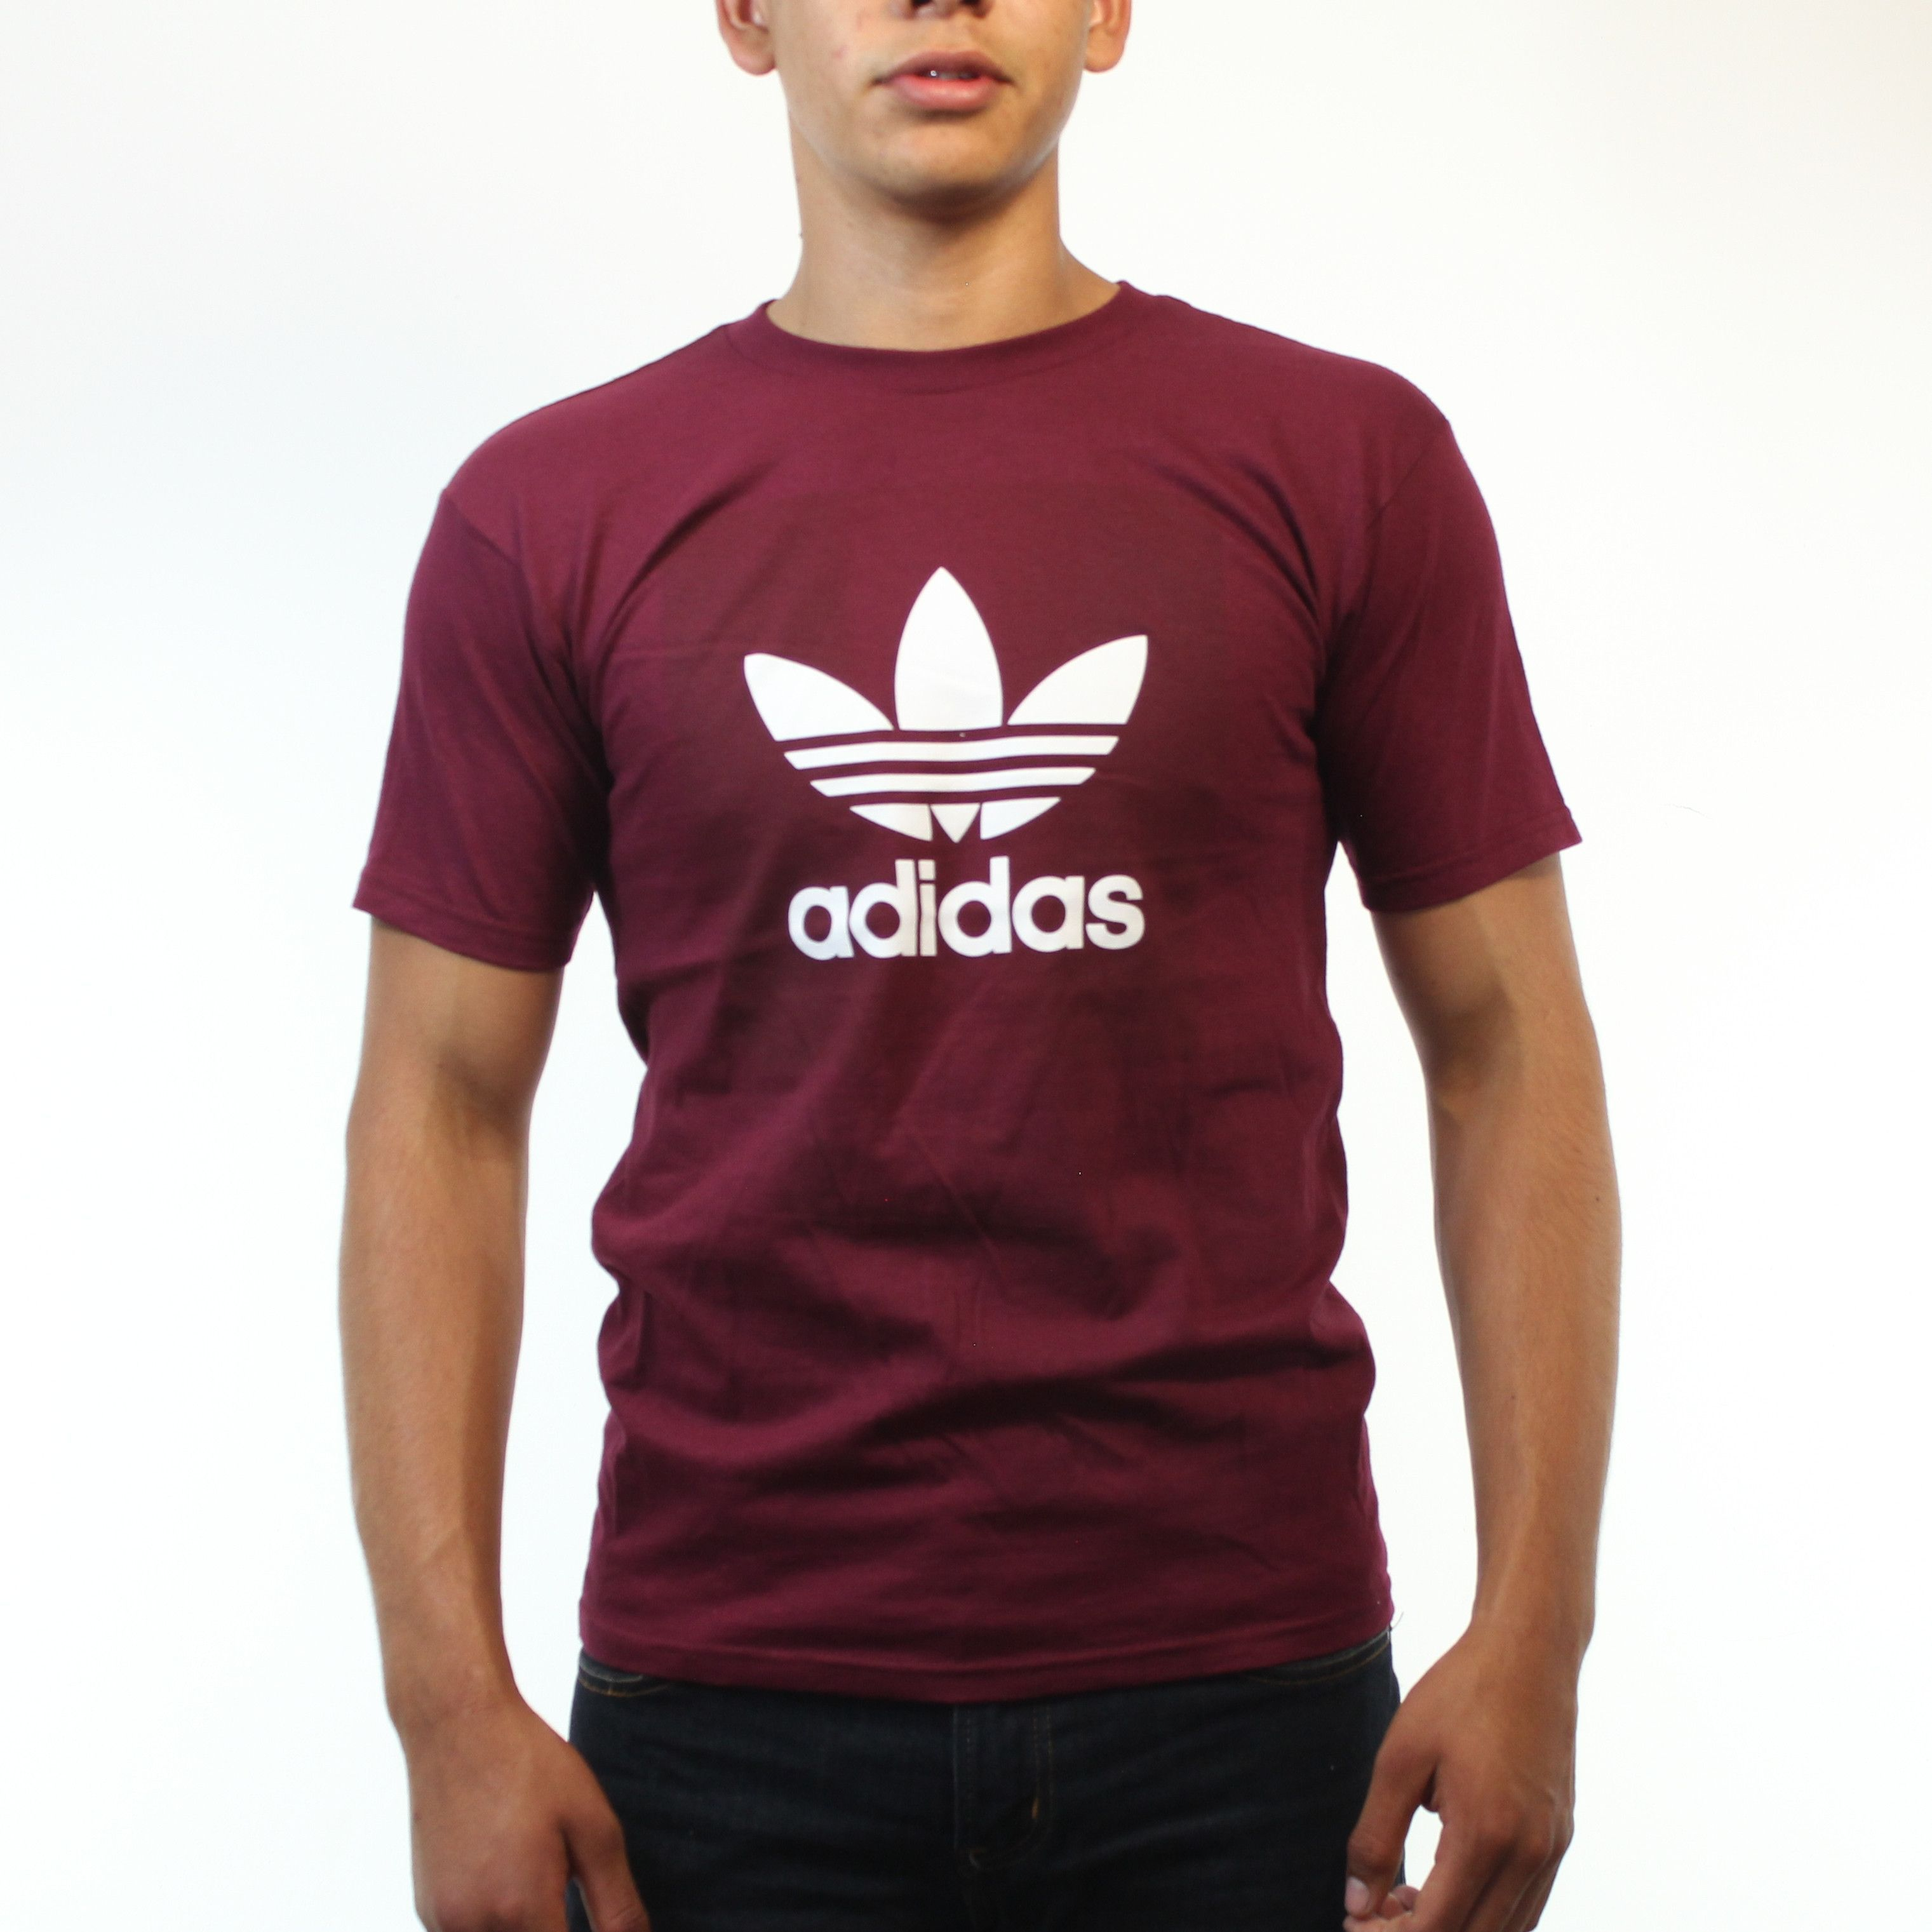 f69b9395 Adidas Classic Logo White Color Trefoil Men's Burgundy T-shirt ...